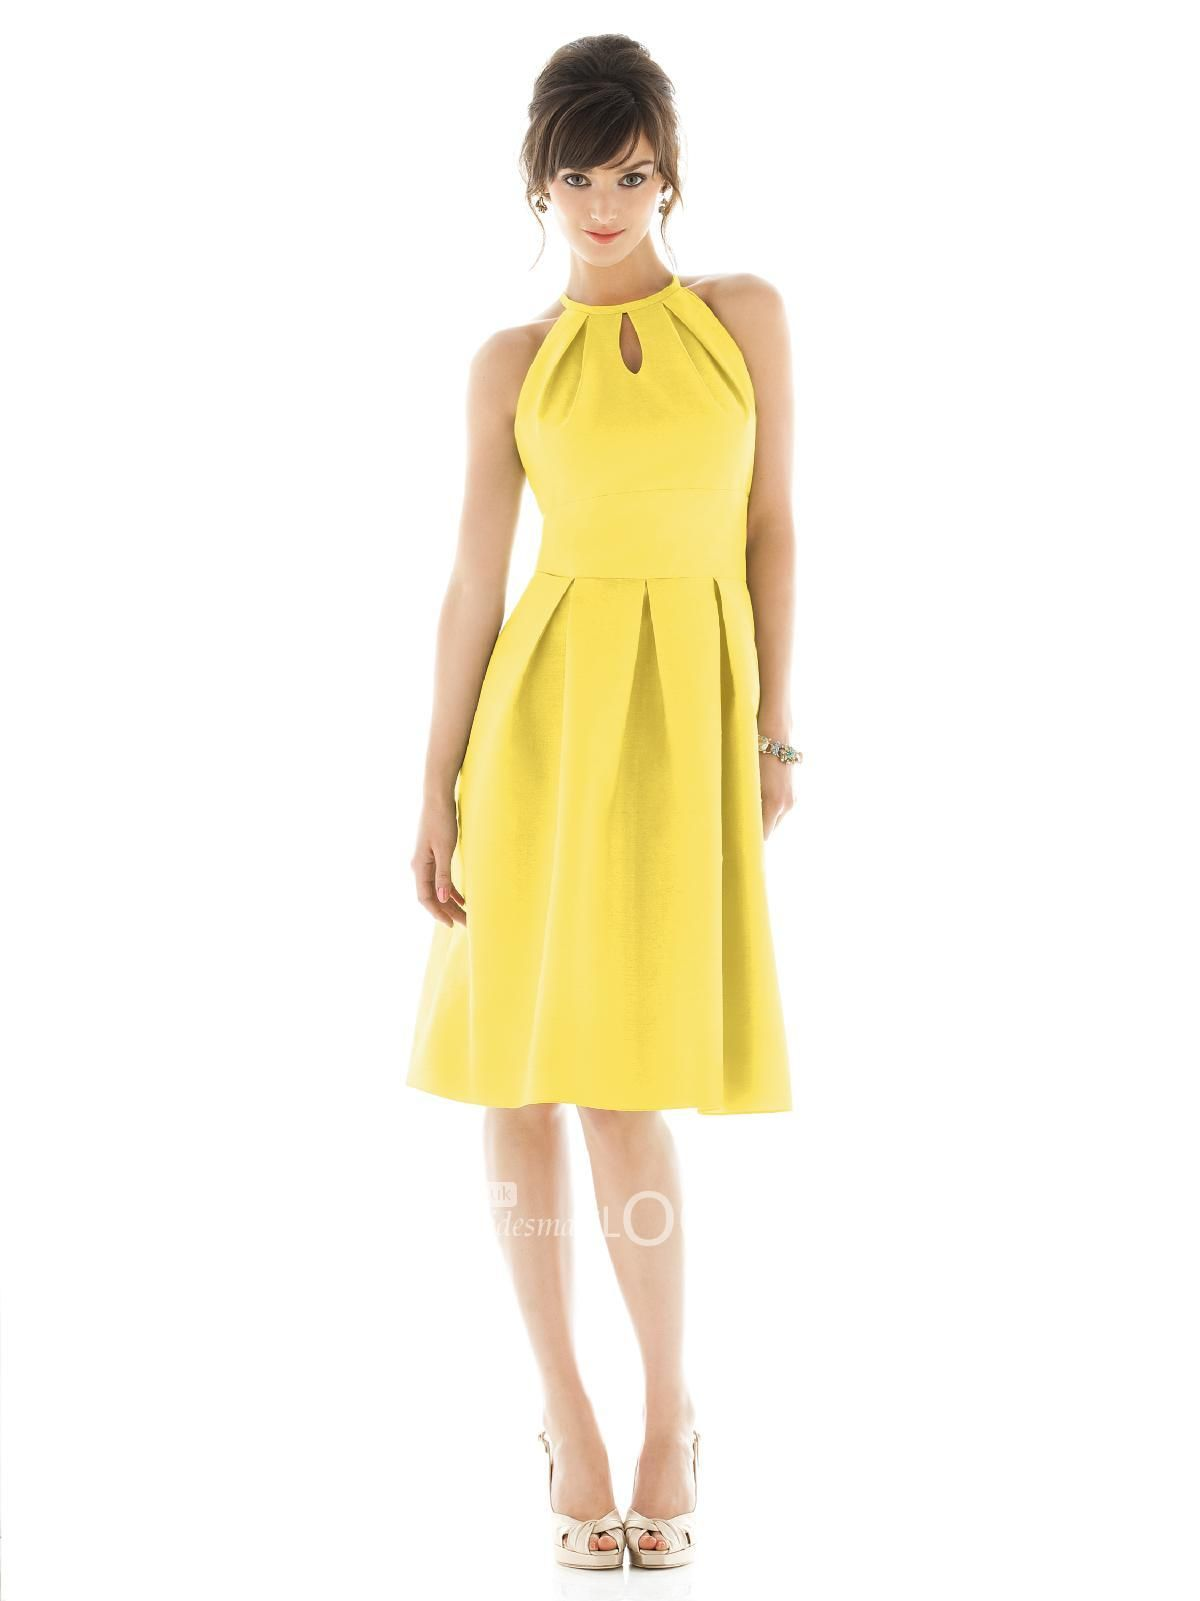 Yellow short halter bridesmaid dress with keyhole neckline yellow short halter bridesmaid dress with keyhole neckline ombrellifo Choice Image